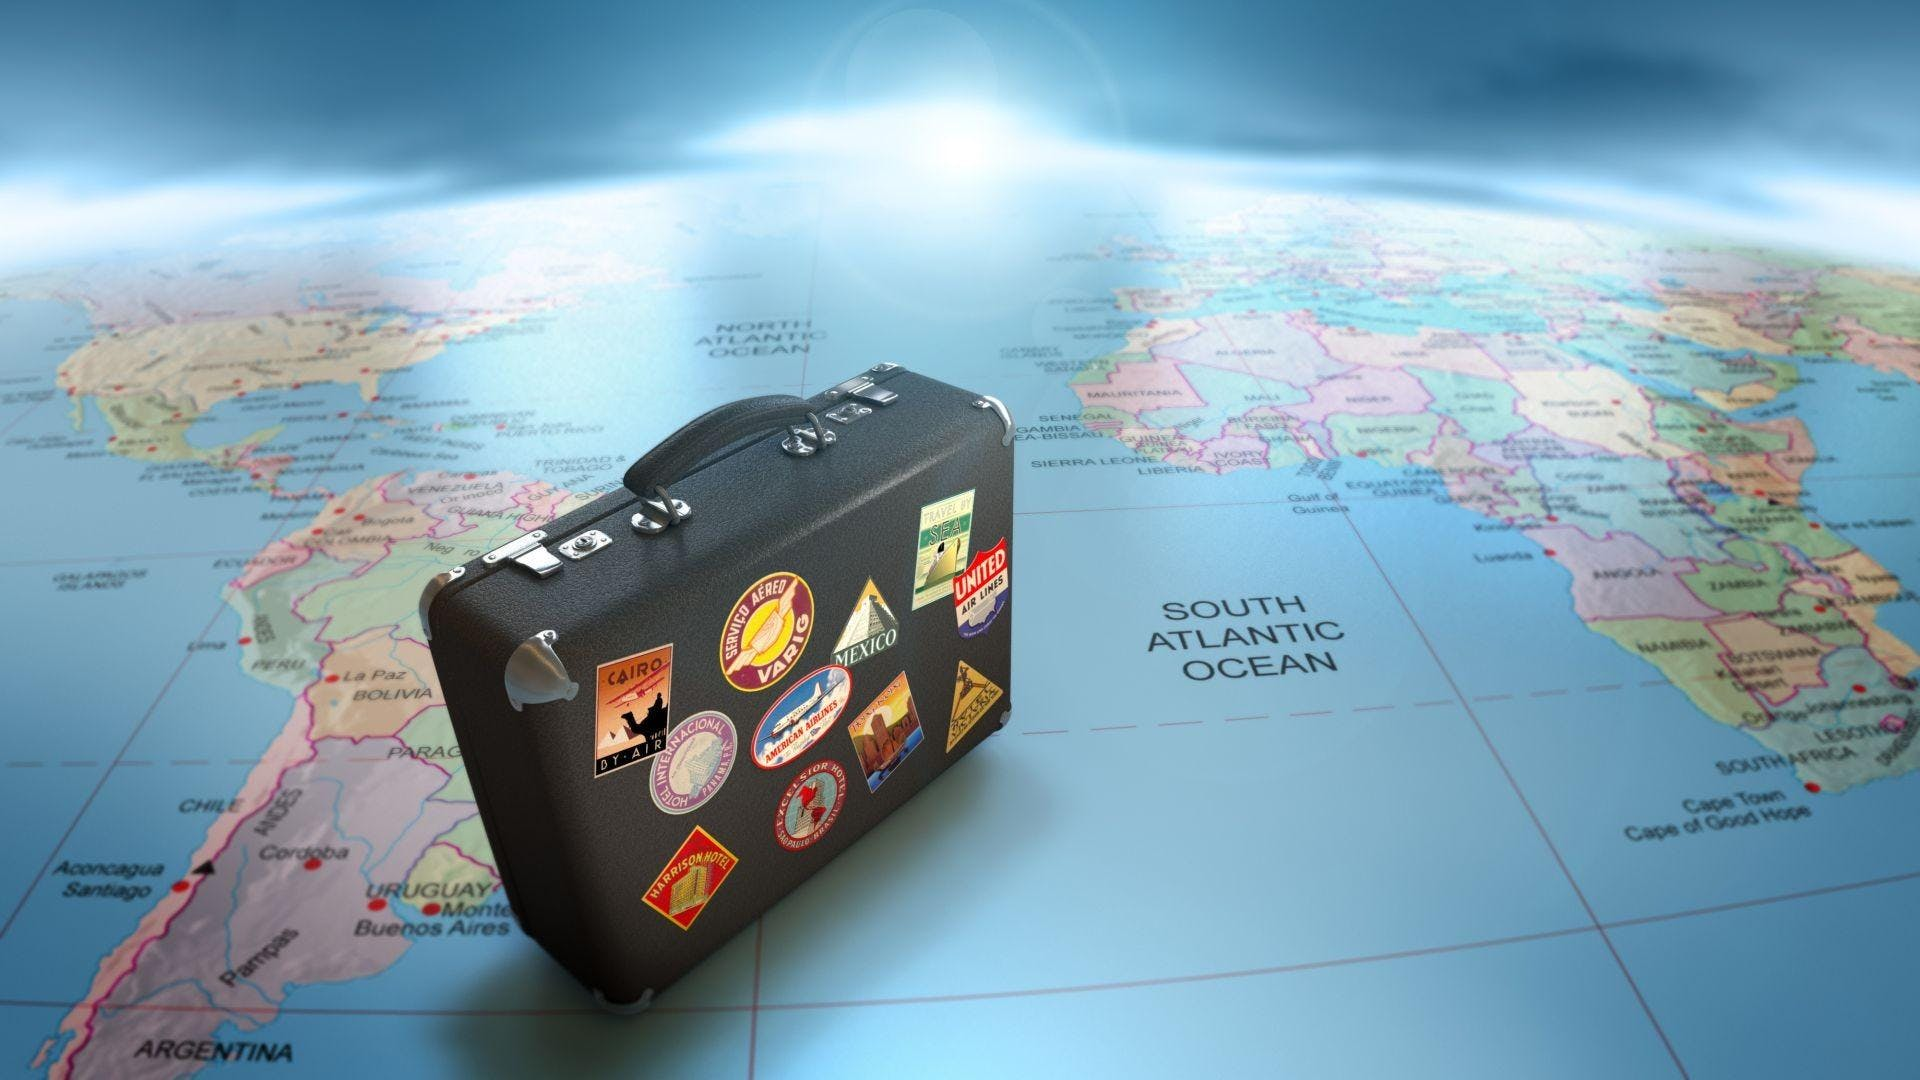 Become A Home-Based Travel Agent - Phoenix, AZ